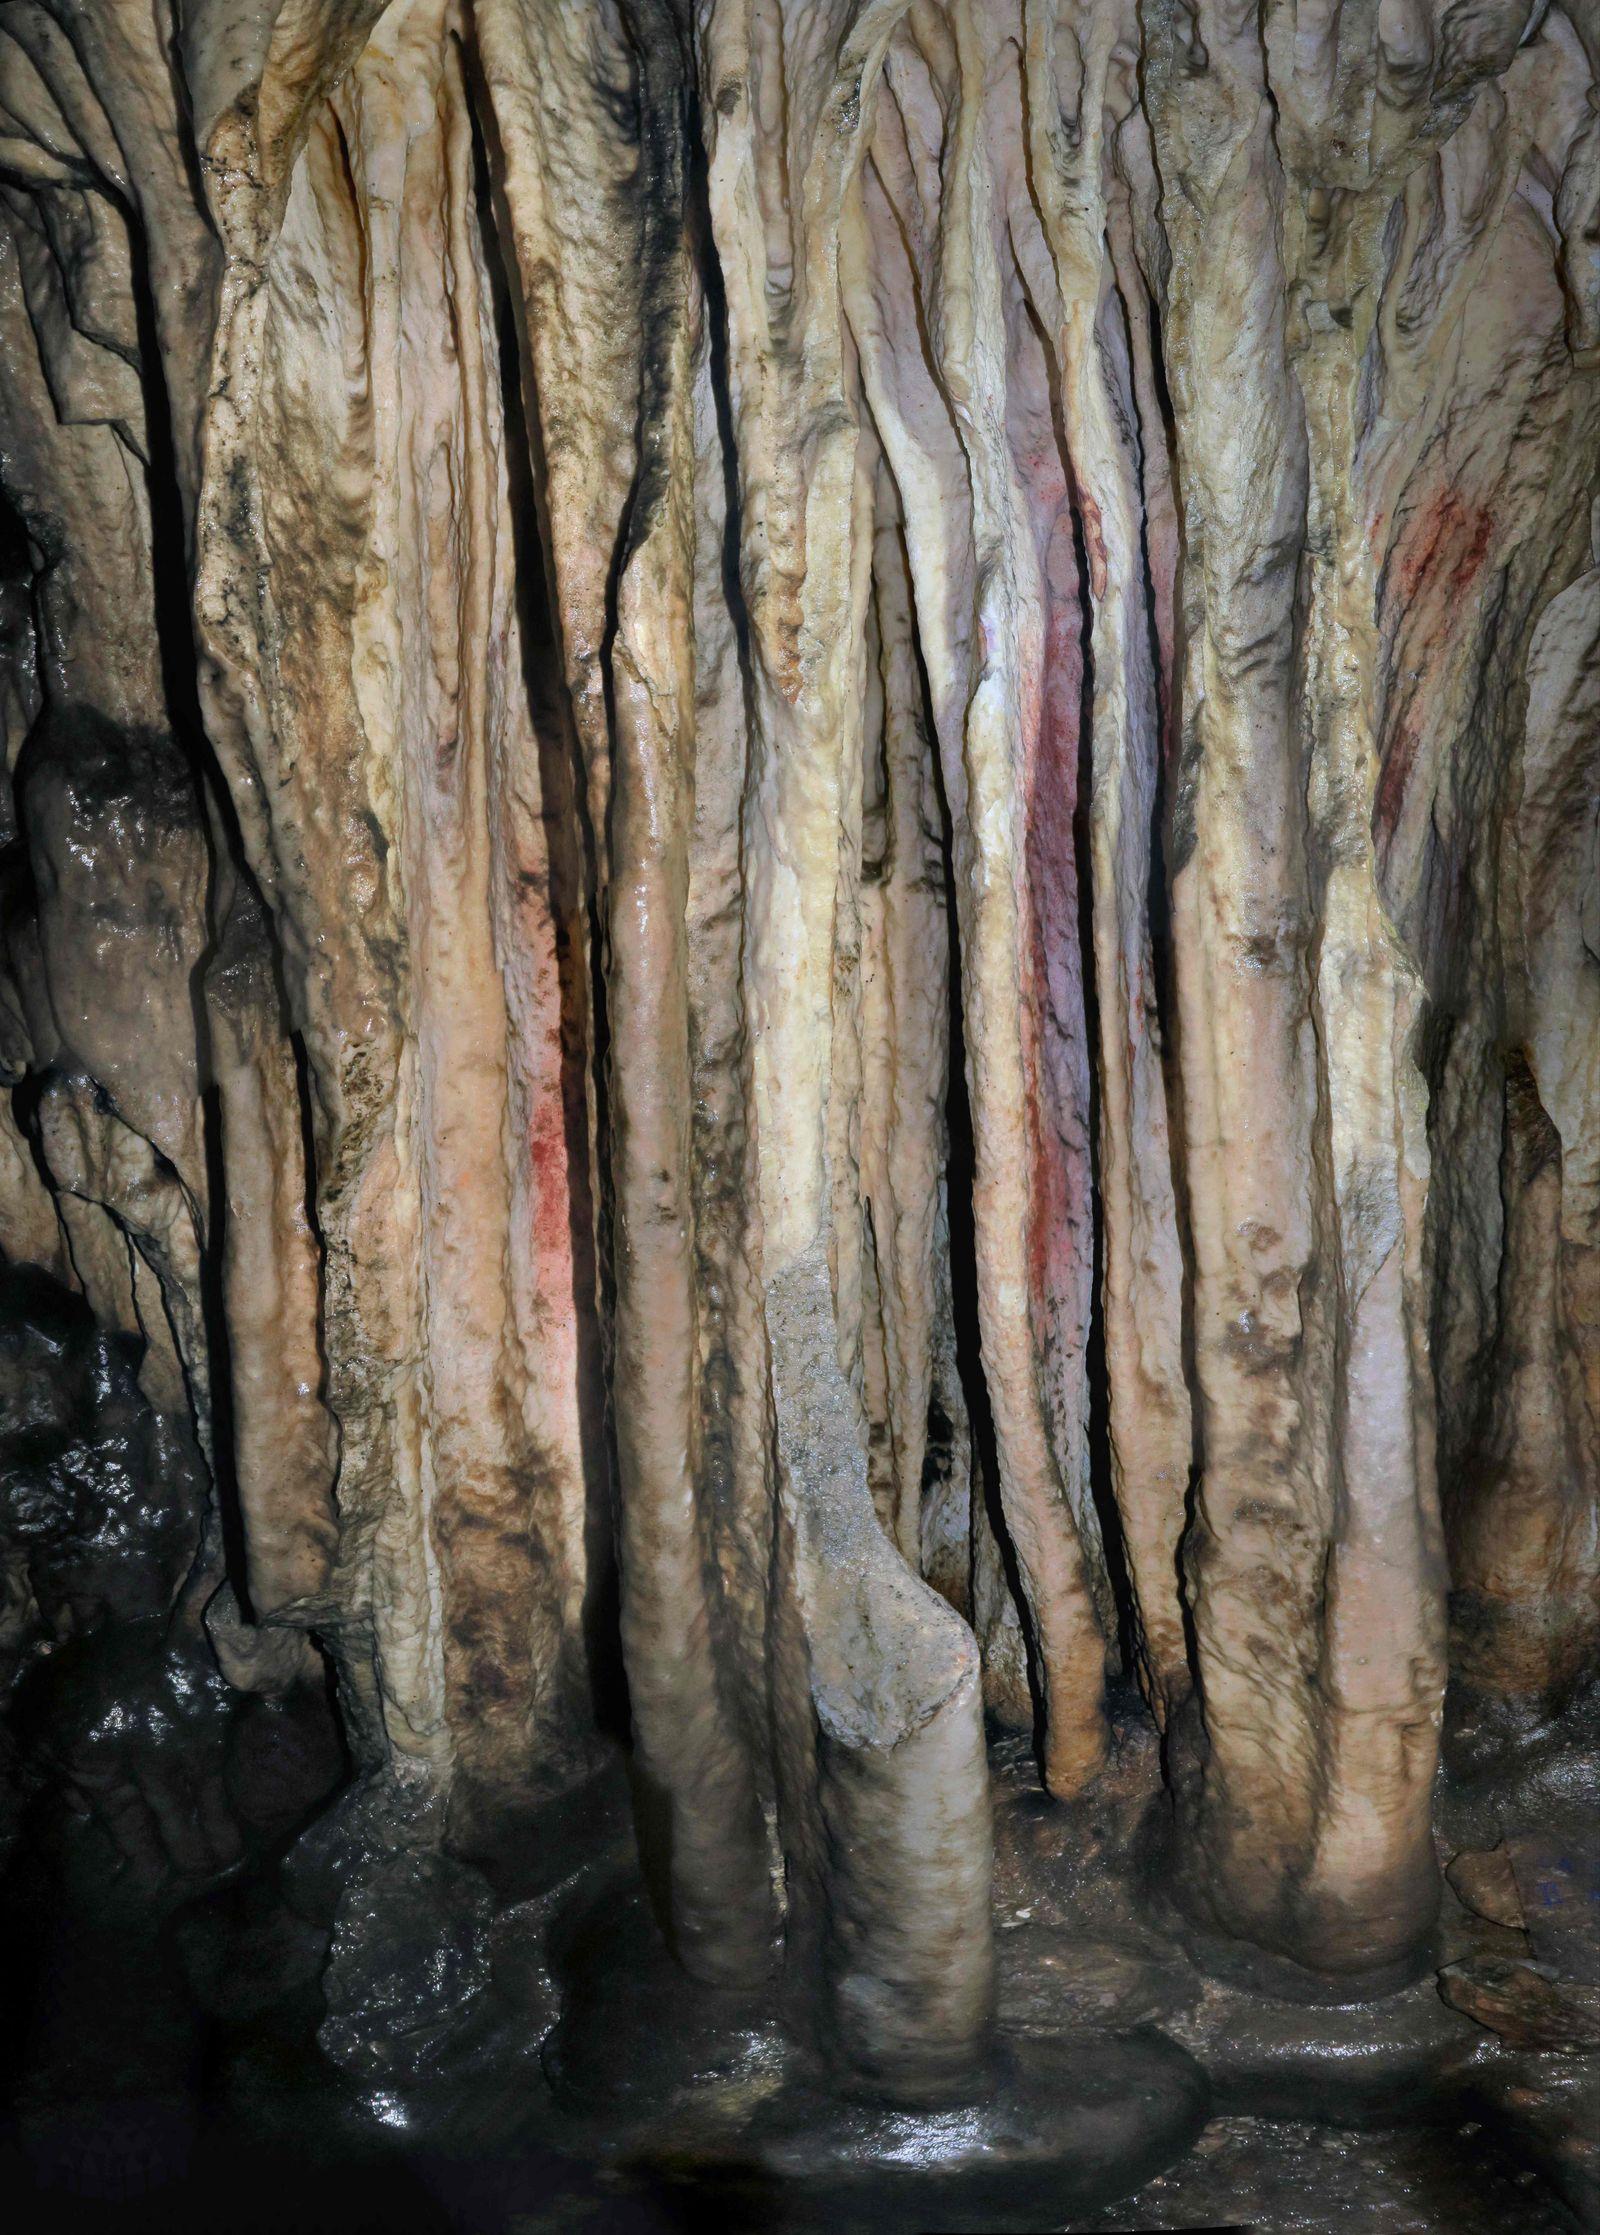 SPAIN-ARCHAEOLOGY-NEANDERTHAL-PREHISTORY